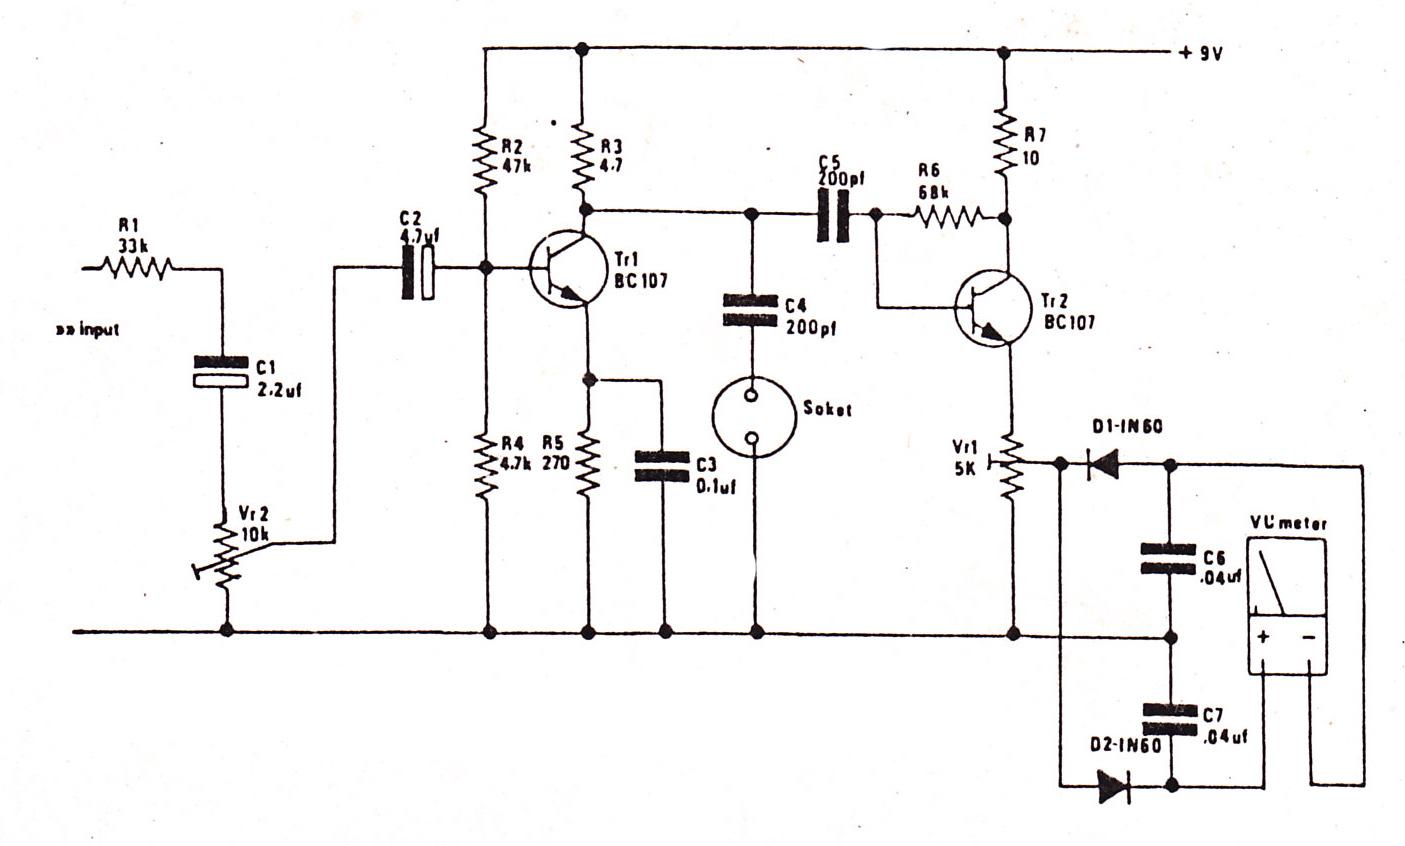 audio mixer circuit diagram using fet 2n3819